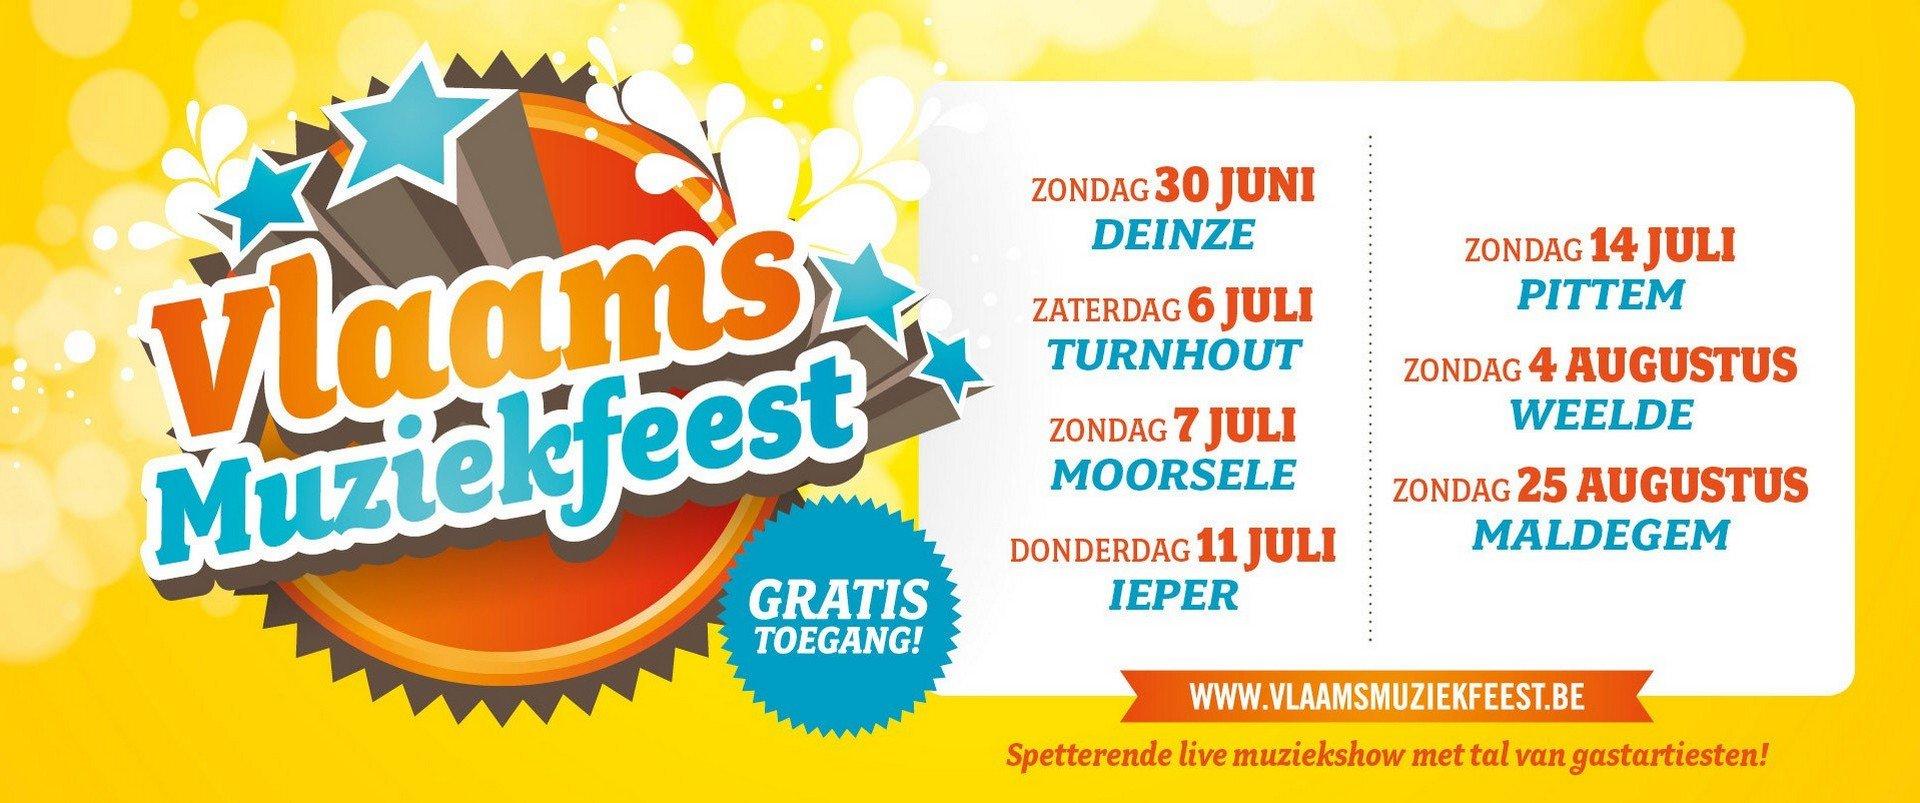 7de Vlaams Muziekfeest strikt o.a. De Romeo's, Lindsay, Swoop en Jo Vally - Logo Vl. muziekfeest 2019